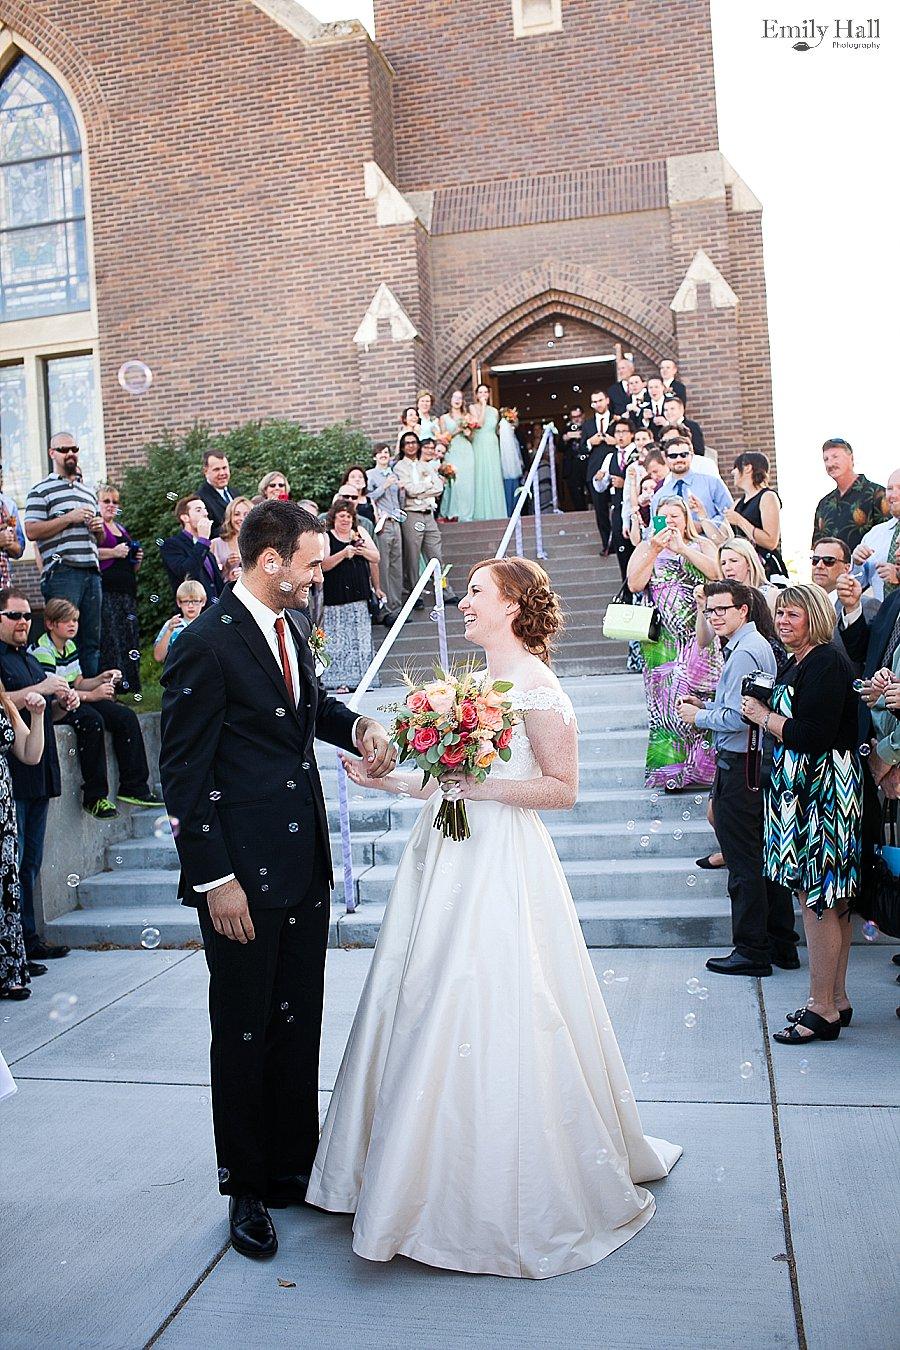 Emily Hall Photography - Corvallis Wedding Photographer-514.jpg